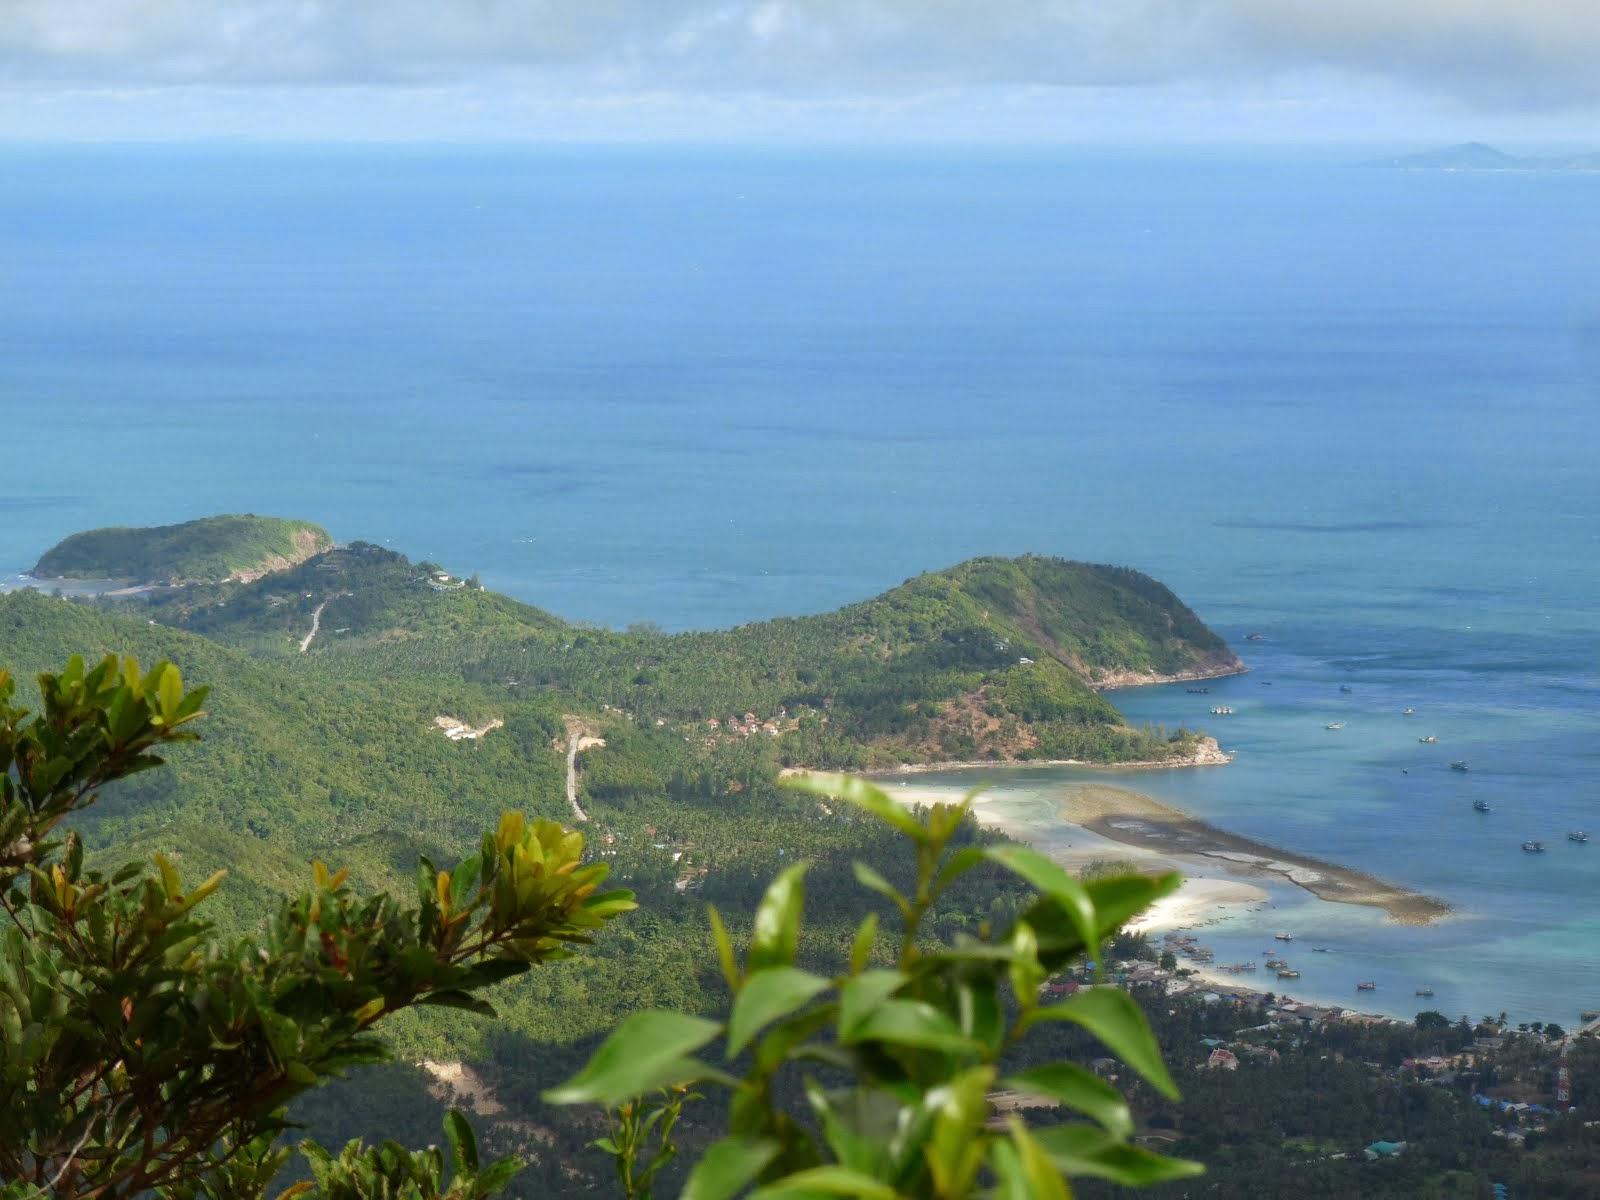 Koh Phangan ~ 泰国 (Thailand)